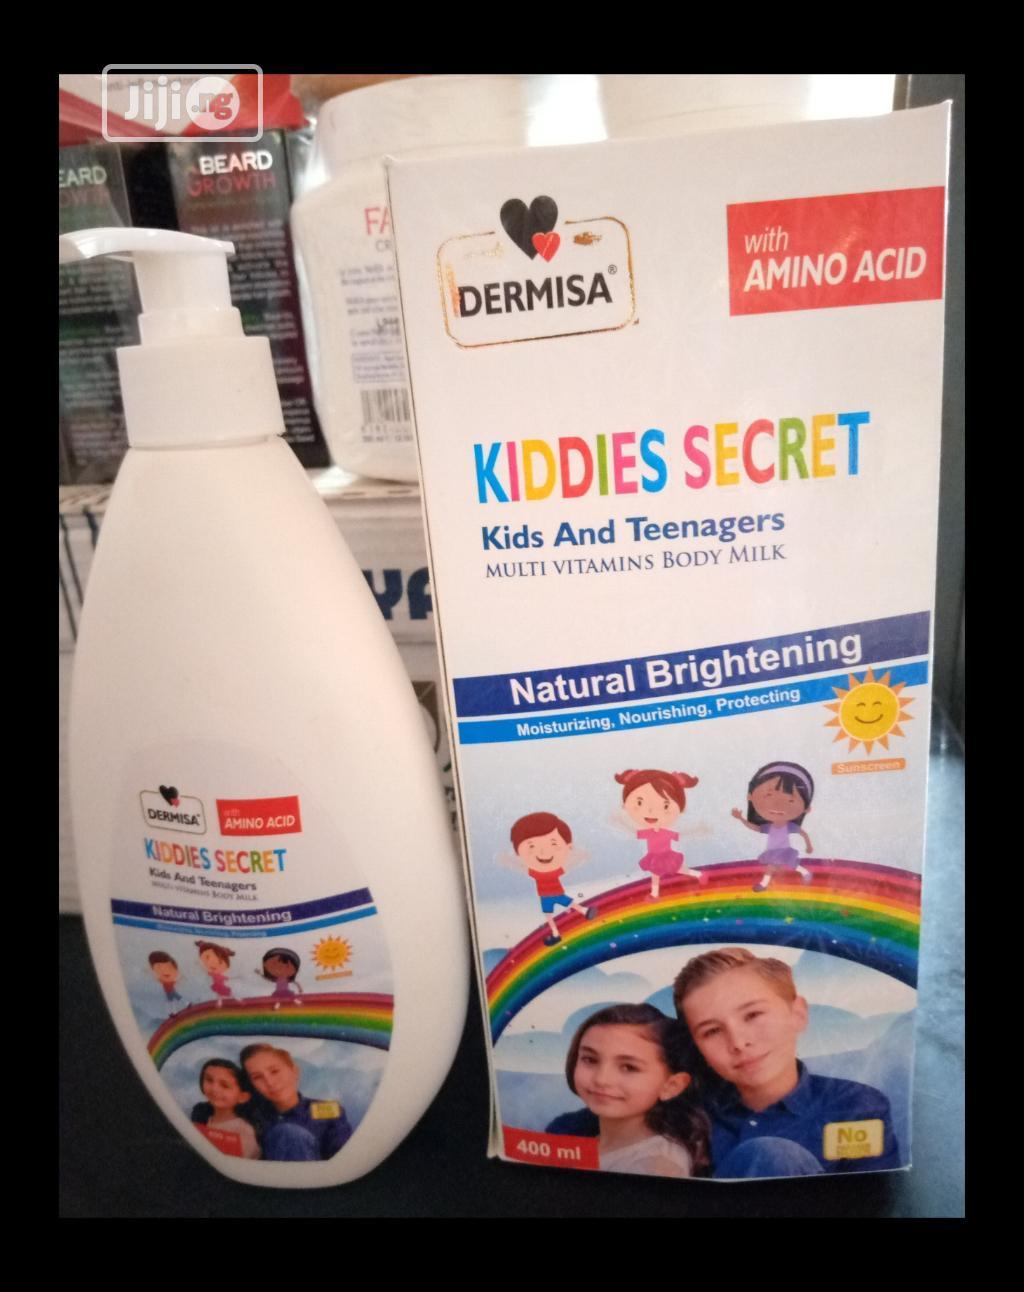 Kiddies Secret Kid's and Teens With Multi Vitamins Body Milk